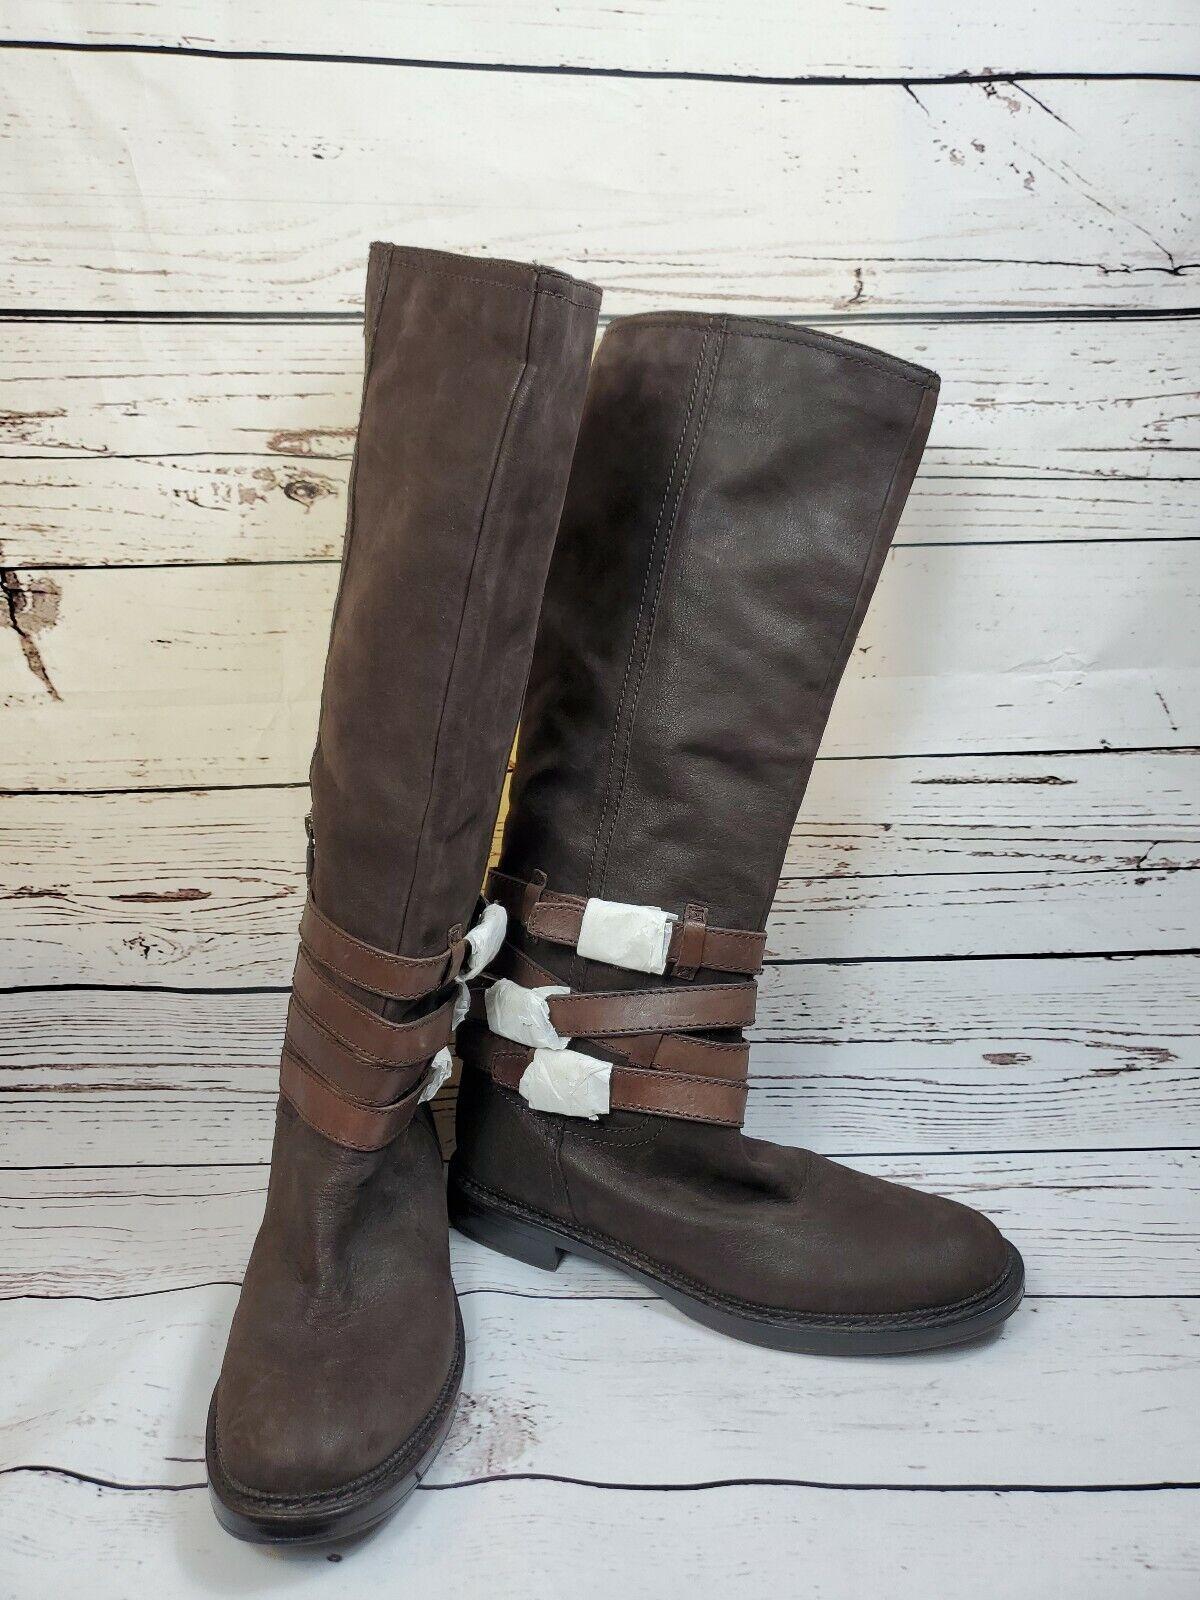 NEW B. Makowsky sz 11 Kadin Brown Leather Tall Knee Boots Buckles Straps